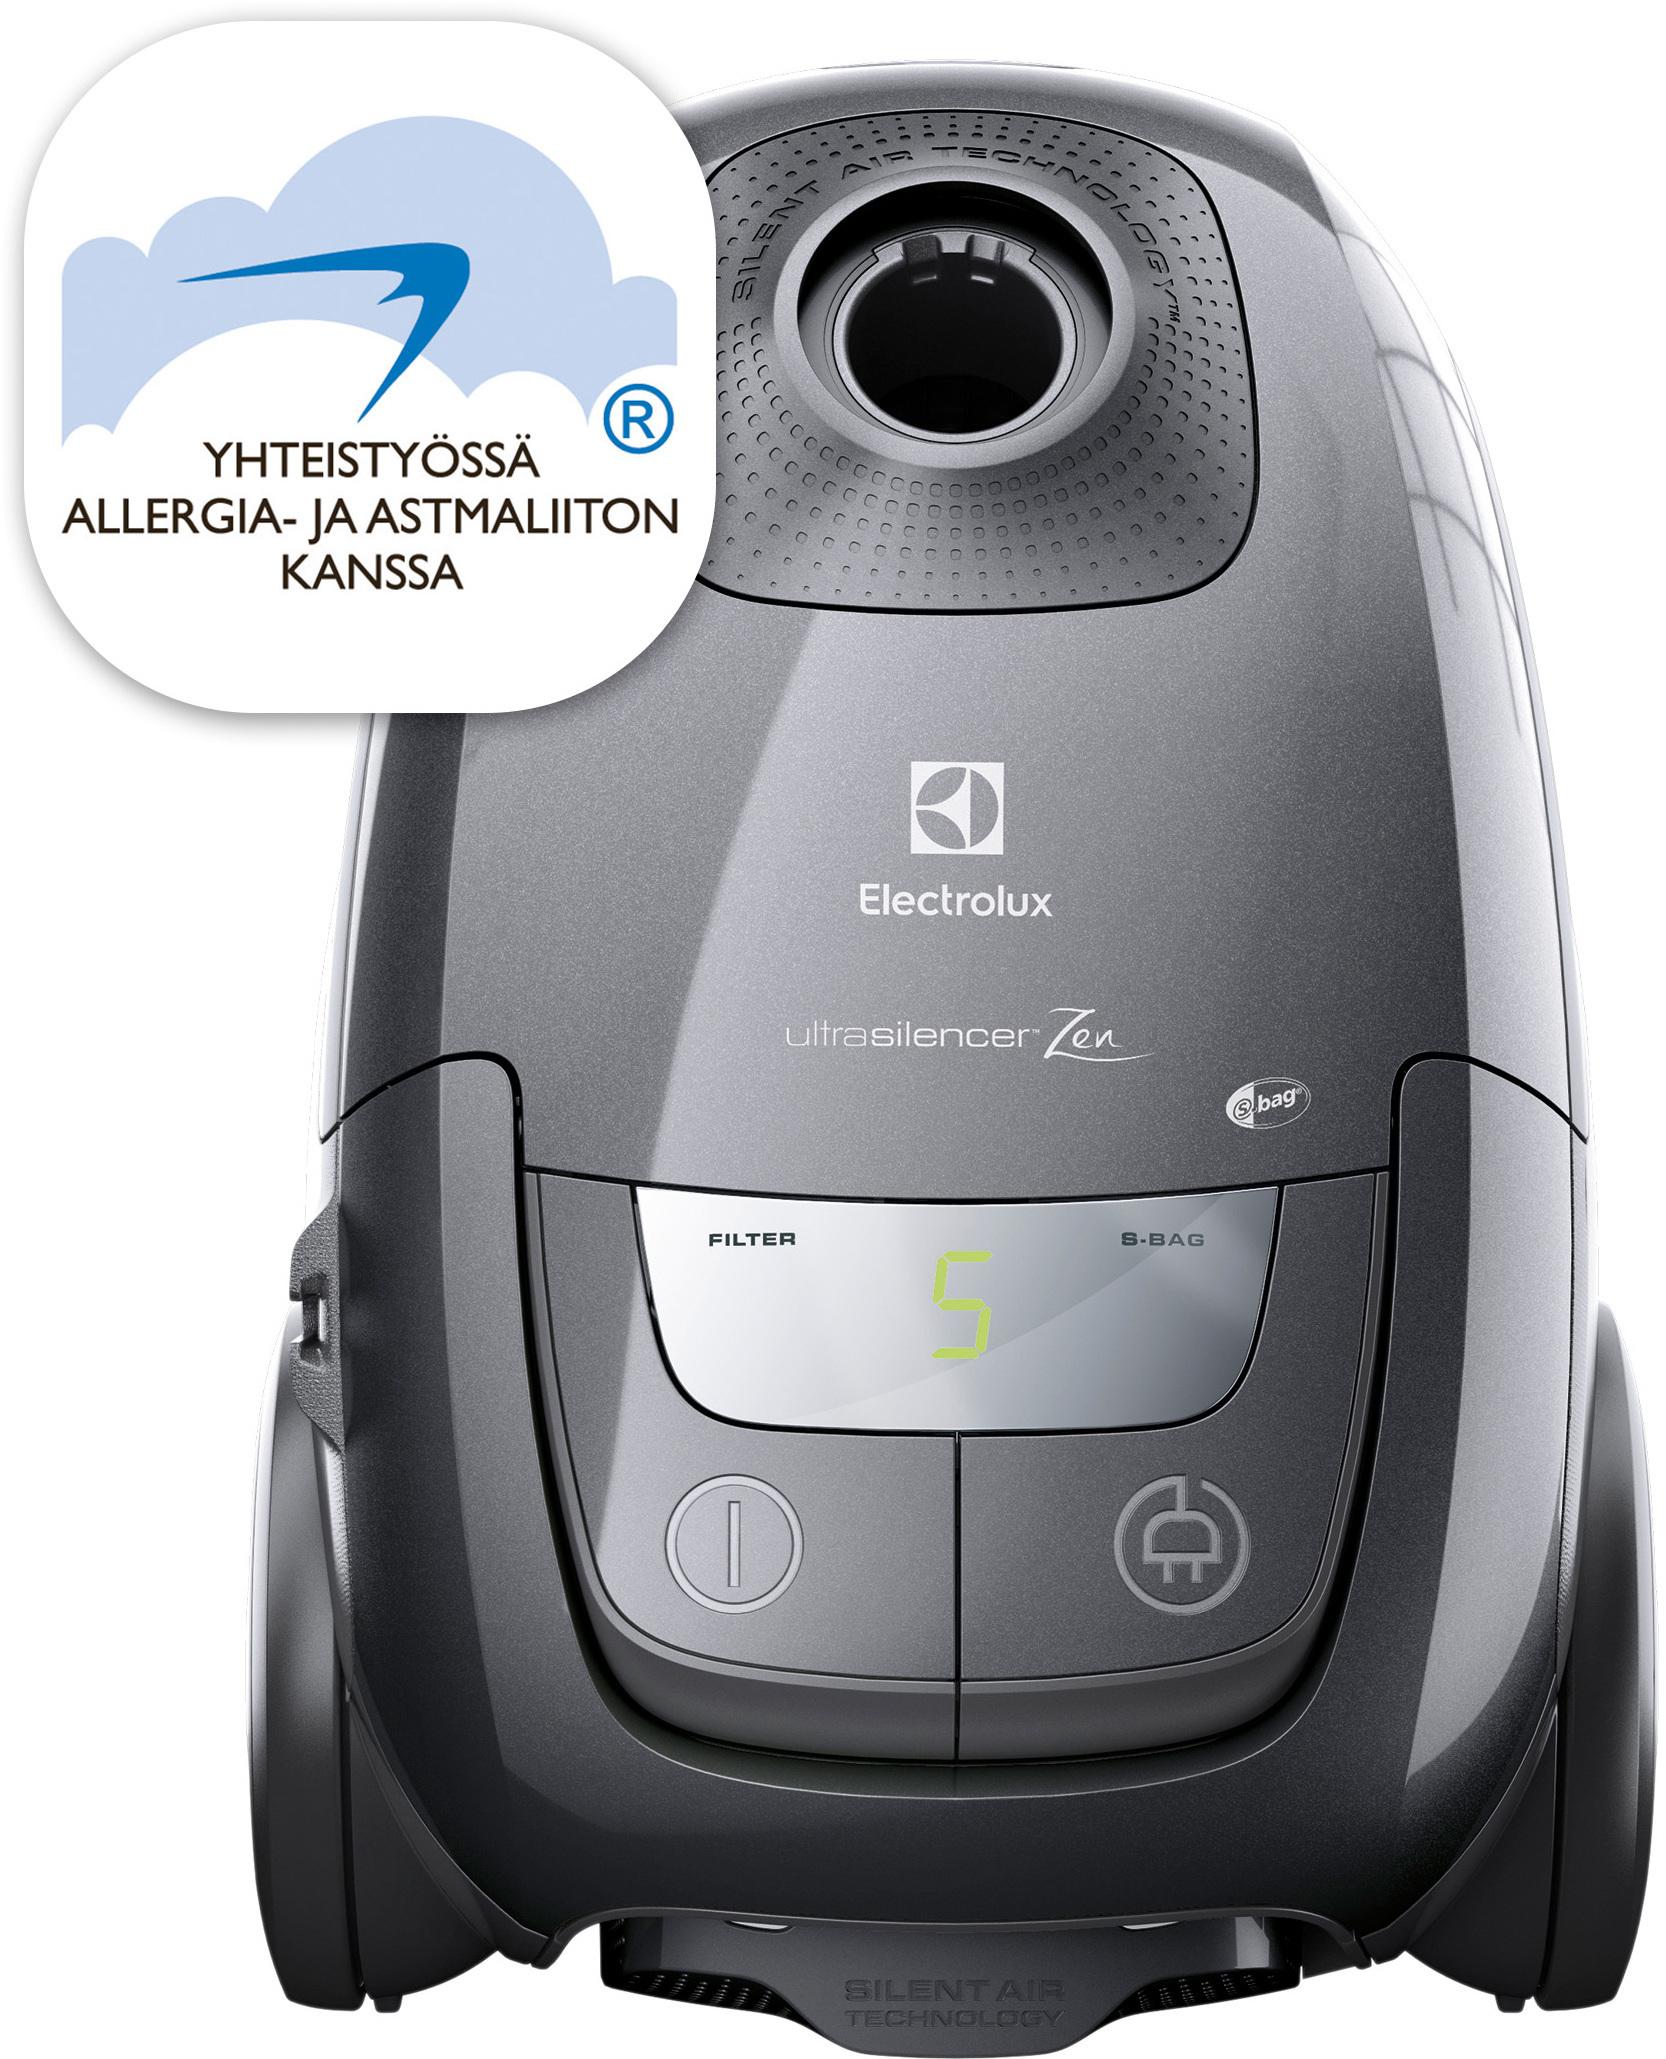 Electrolux UltraSilencer ZEN Deluxe ‐pölynimuri – Pölypussilliset – Pölynimurit – Pienkoneet ...